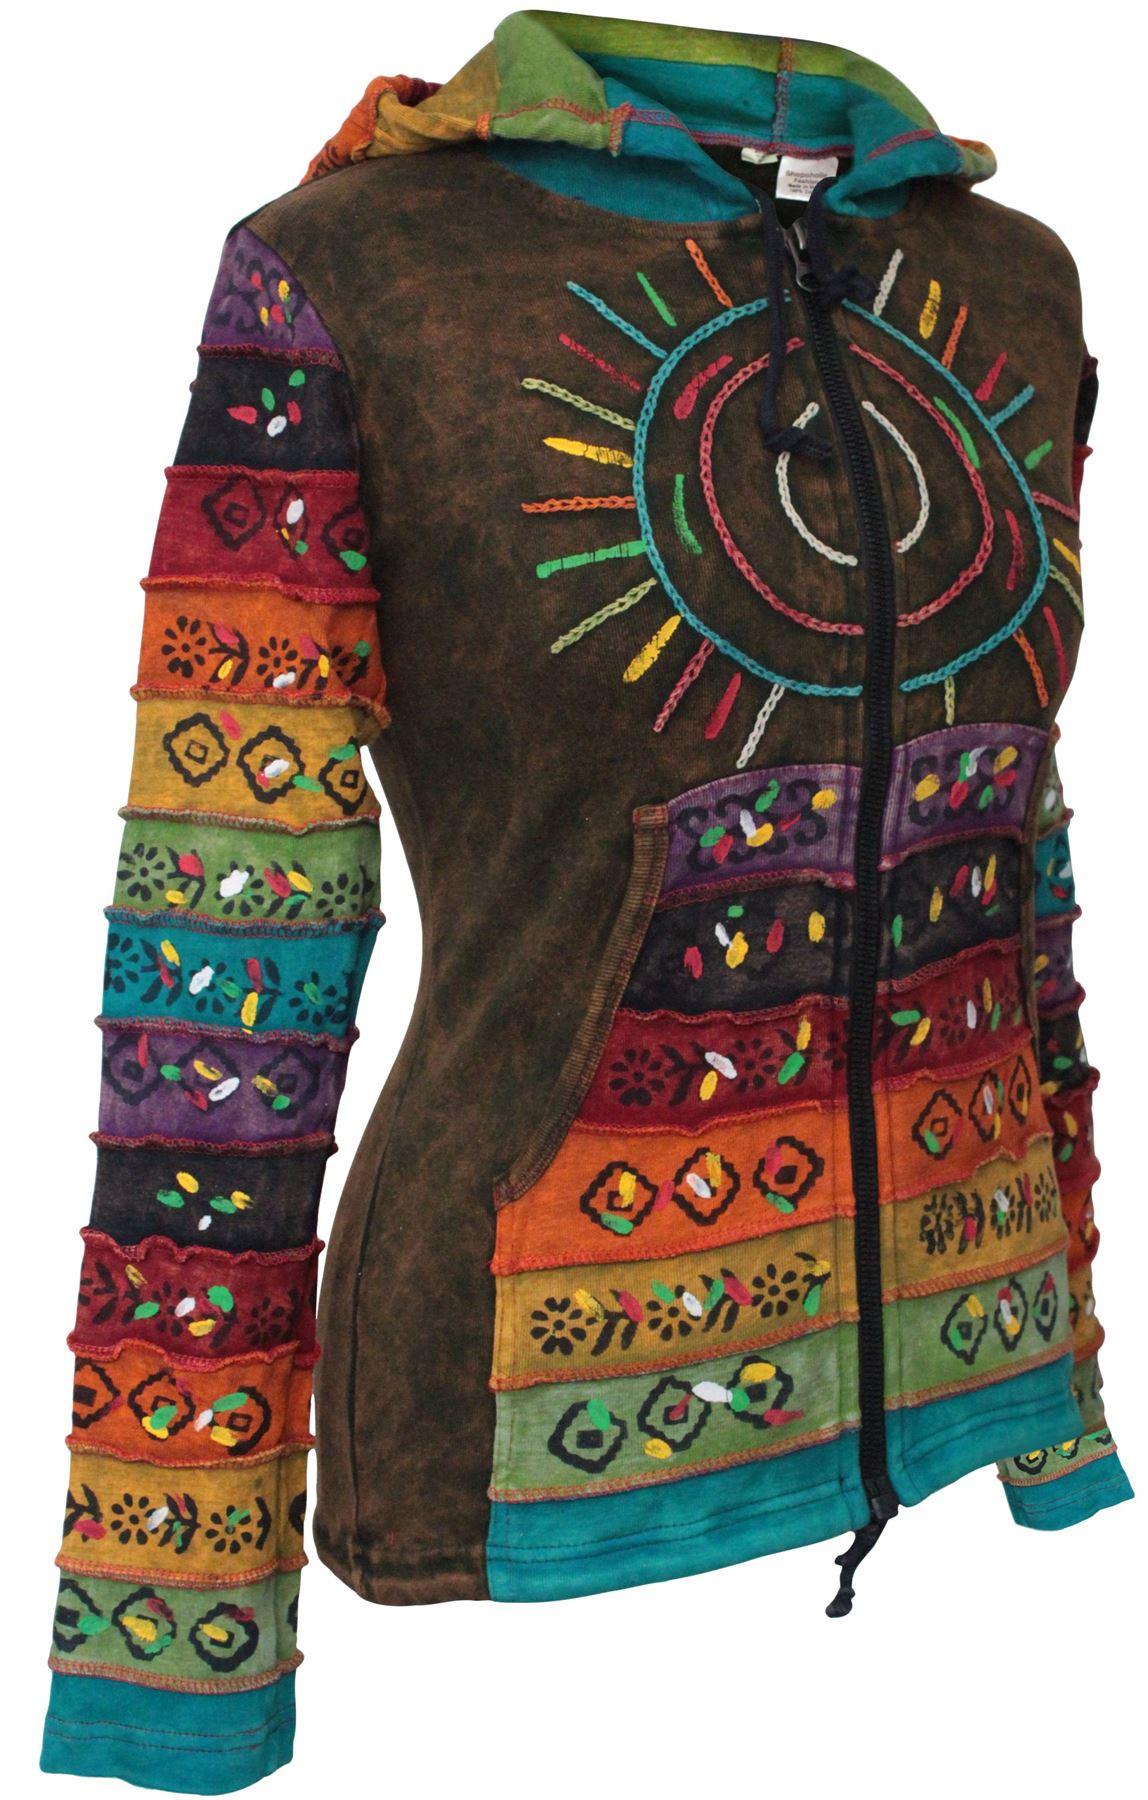 Women-039-s-Sun-Patchwork-Pixie-Hippy-Ribs-Hoodie-Light-Cotton-Hippie-Faded-Jacket thumbnail 9